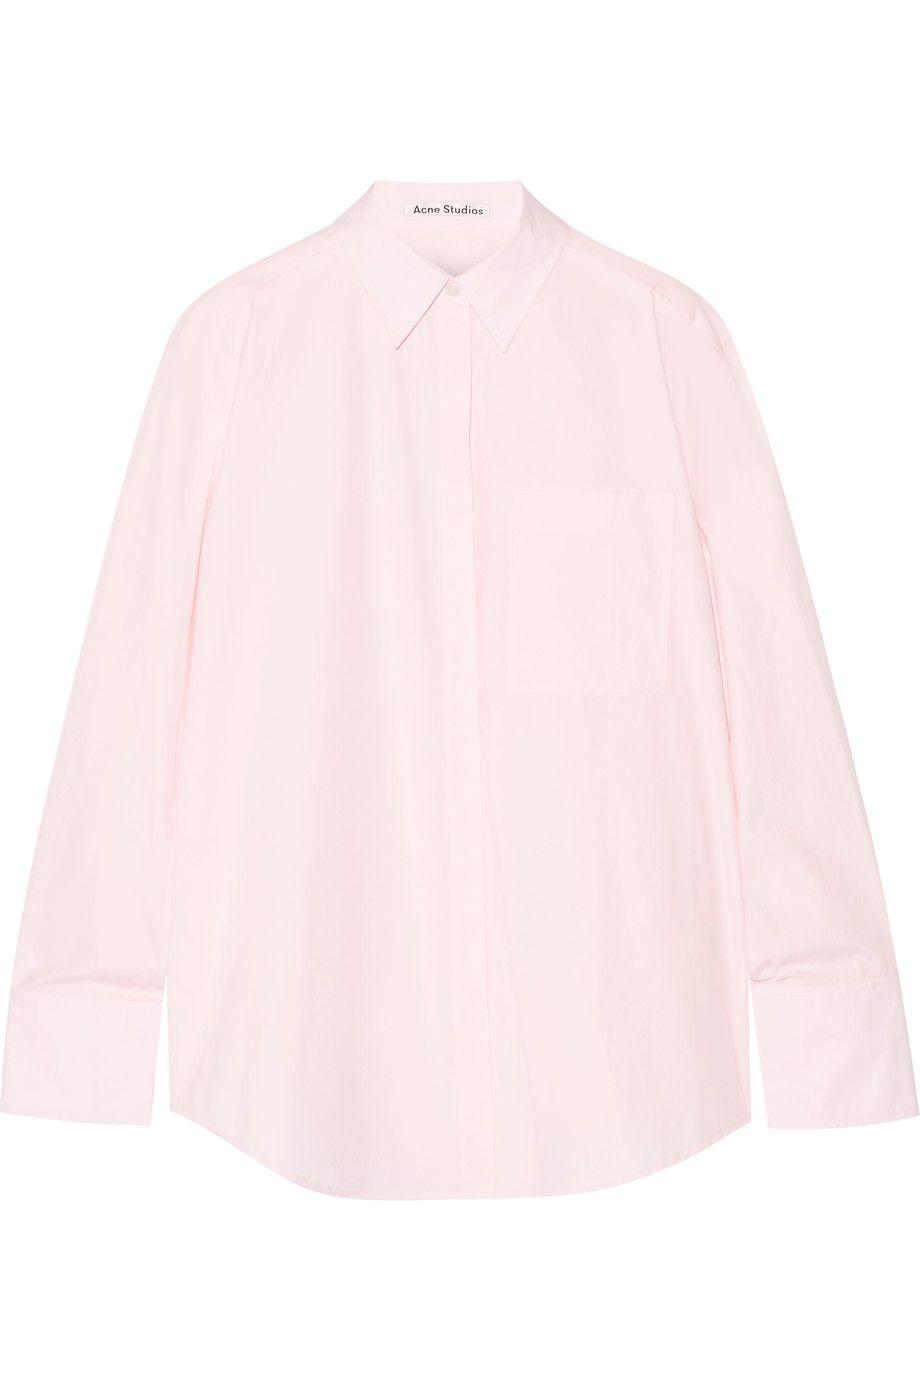 ACNE STUDIOS Addle oversized cotton-poplin shirt. #acnestudios #cloth #shirt